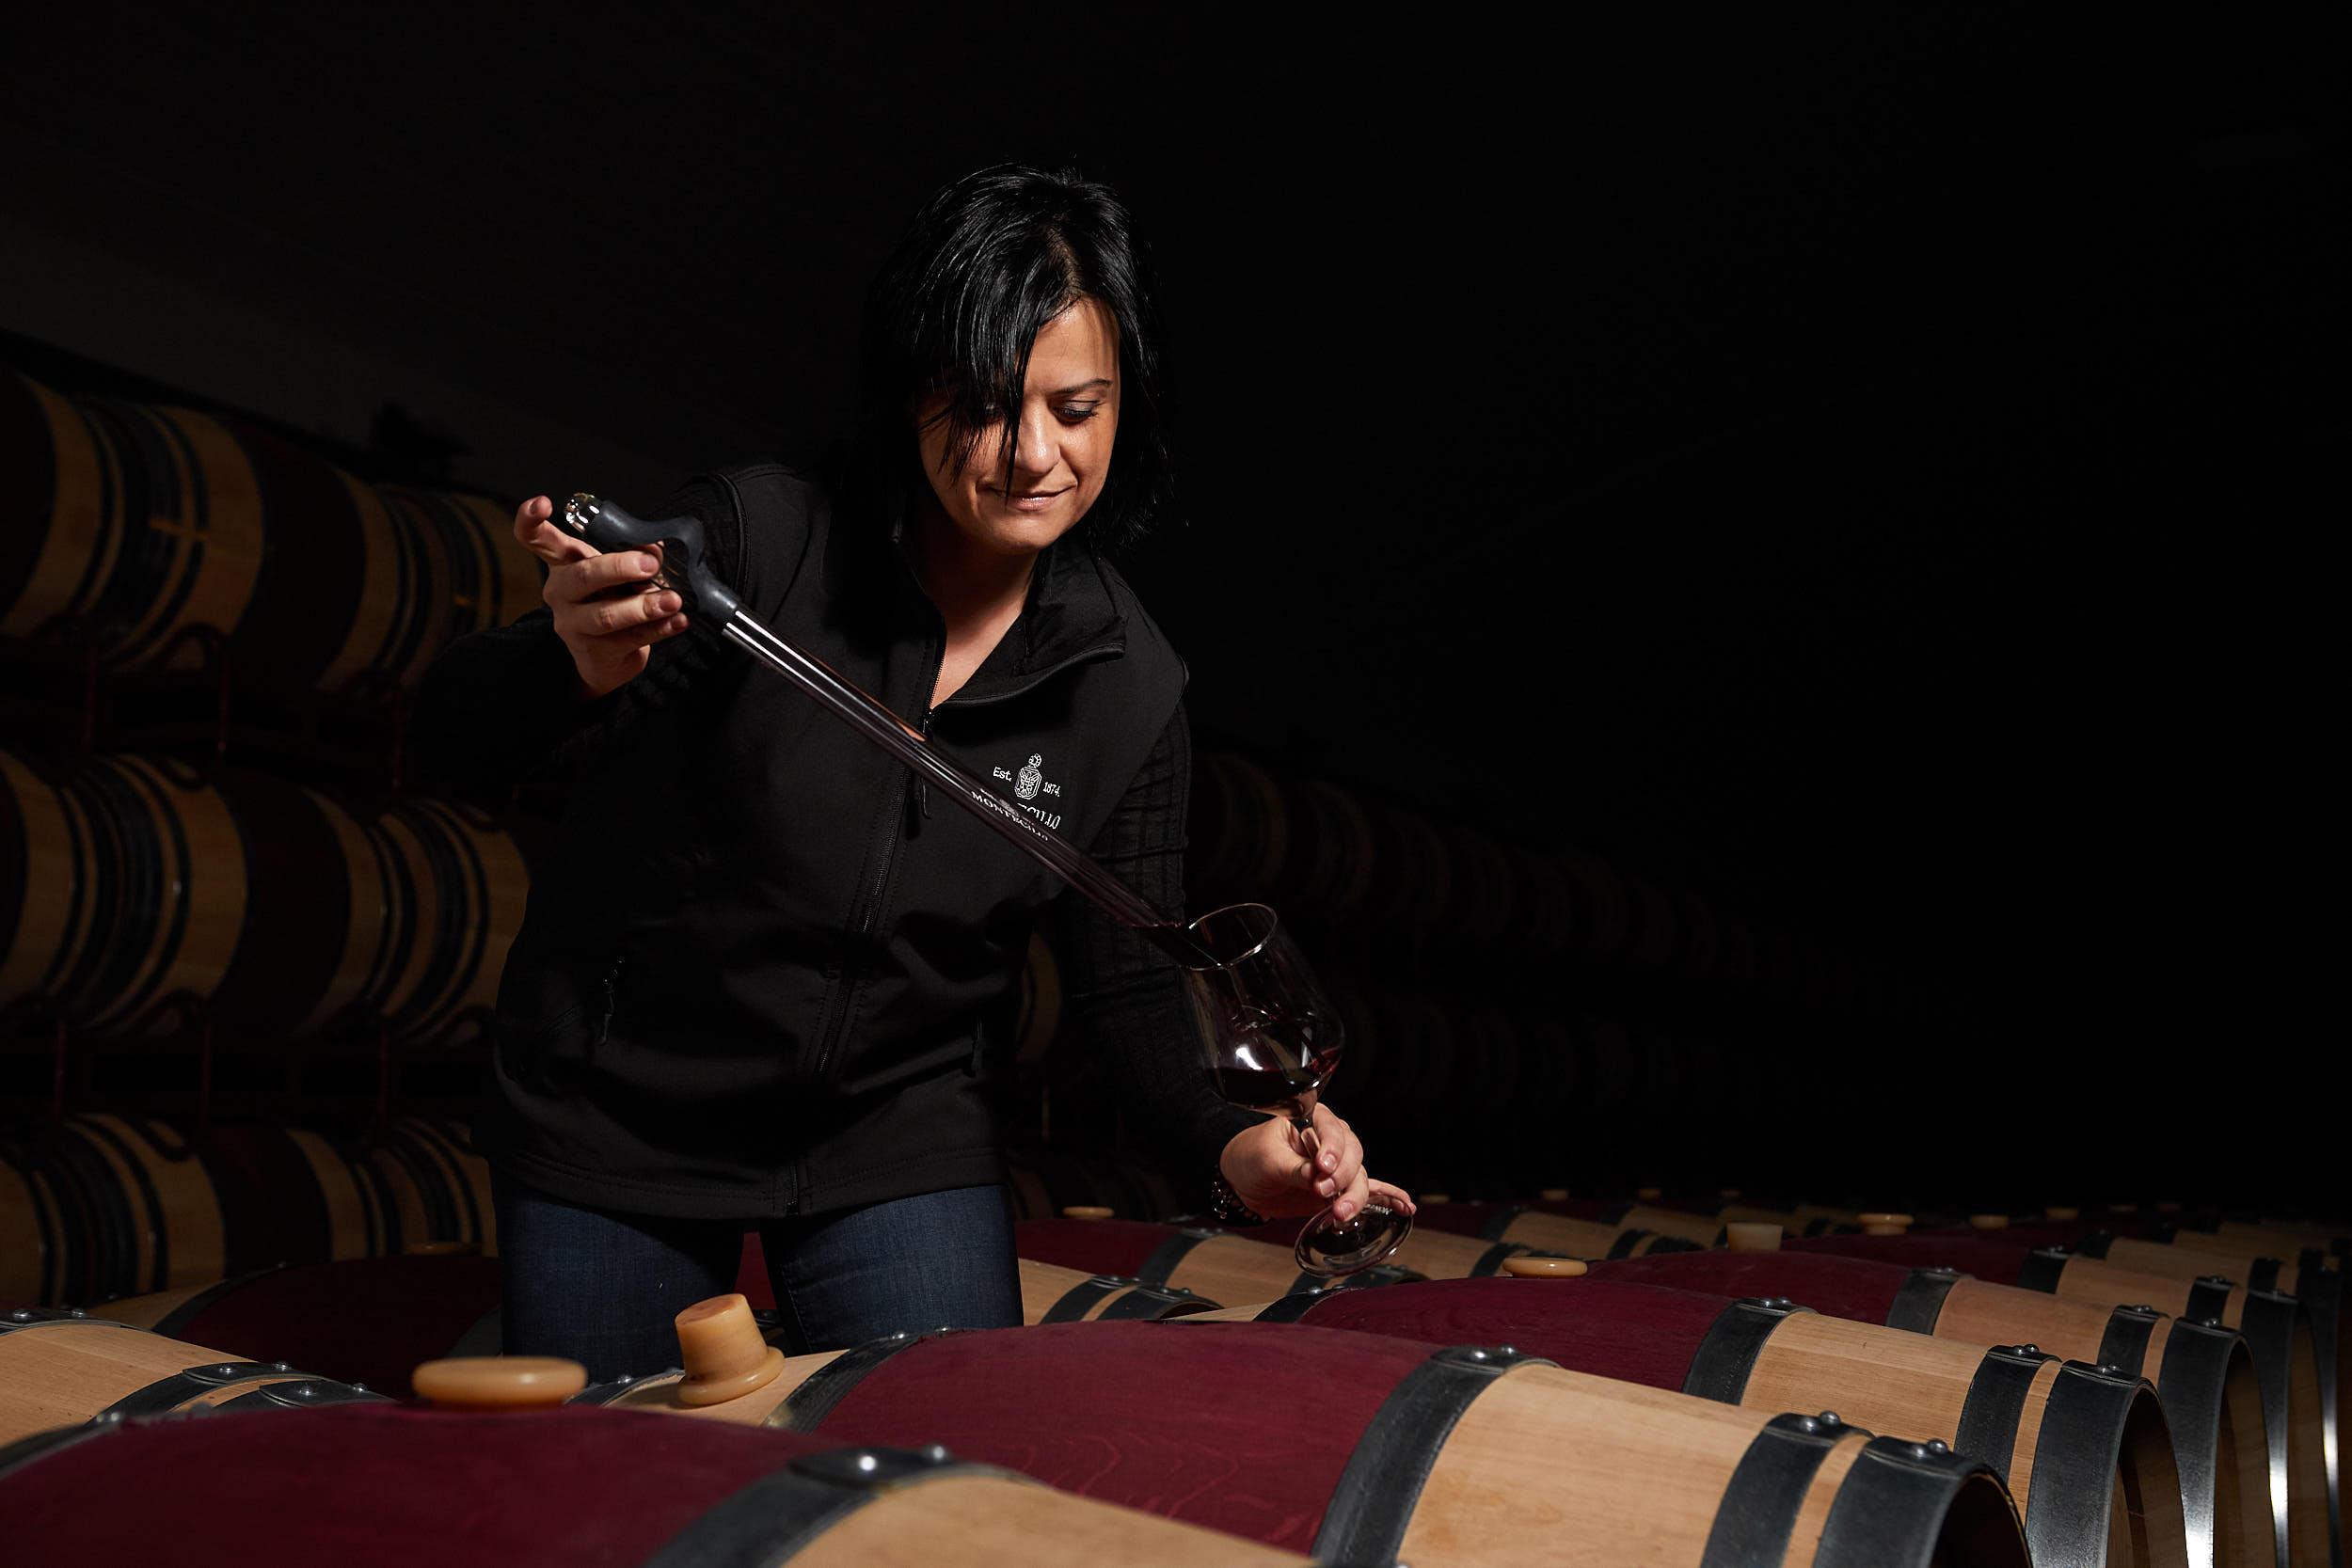 1612Bodegas_Montecillo_Wine_Photography_La_Rioja_Spain_James_Sturcke_sturcke.org_0008.jpg